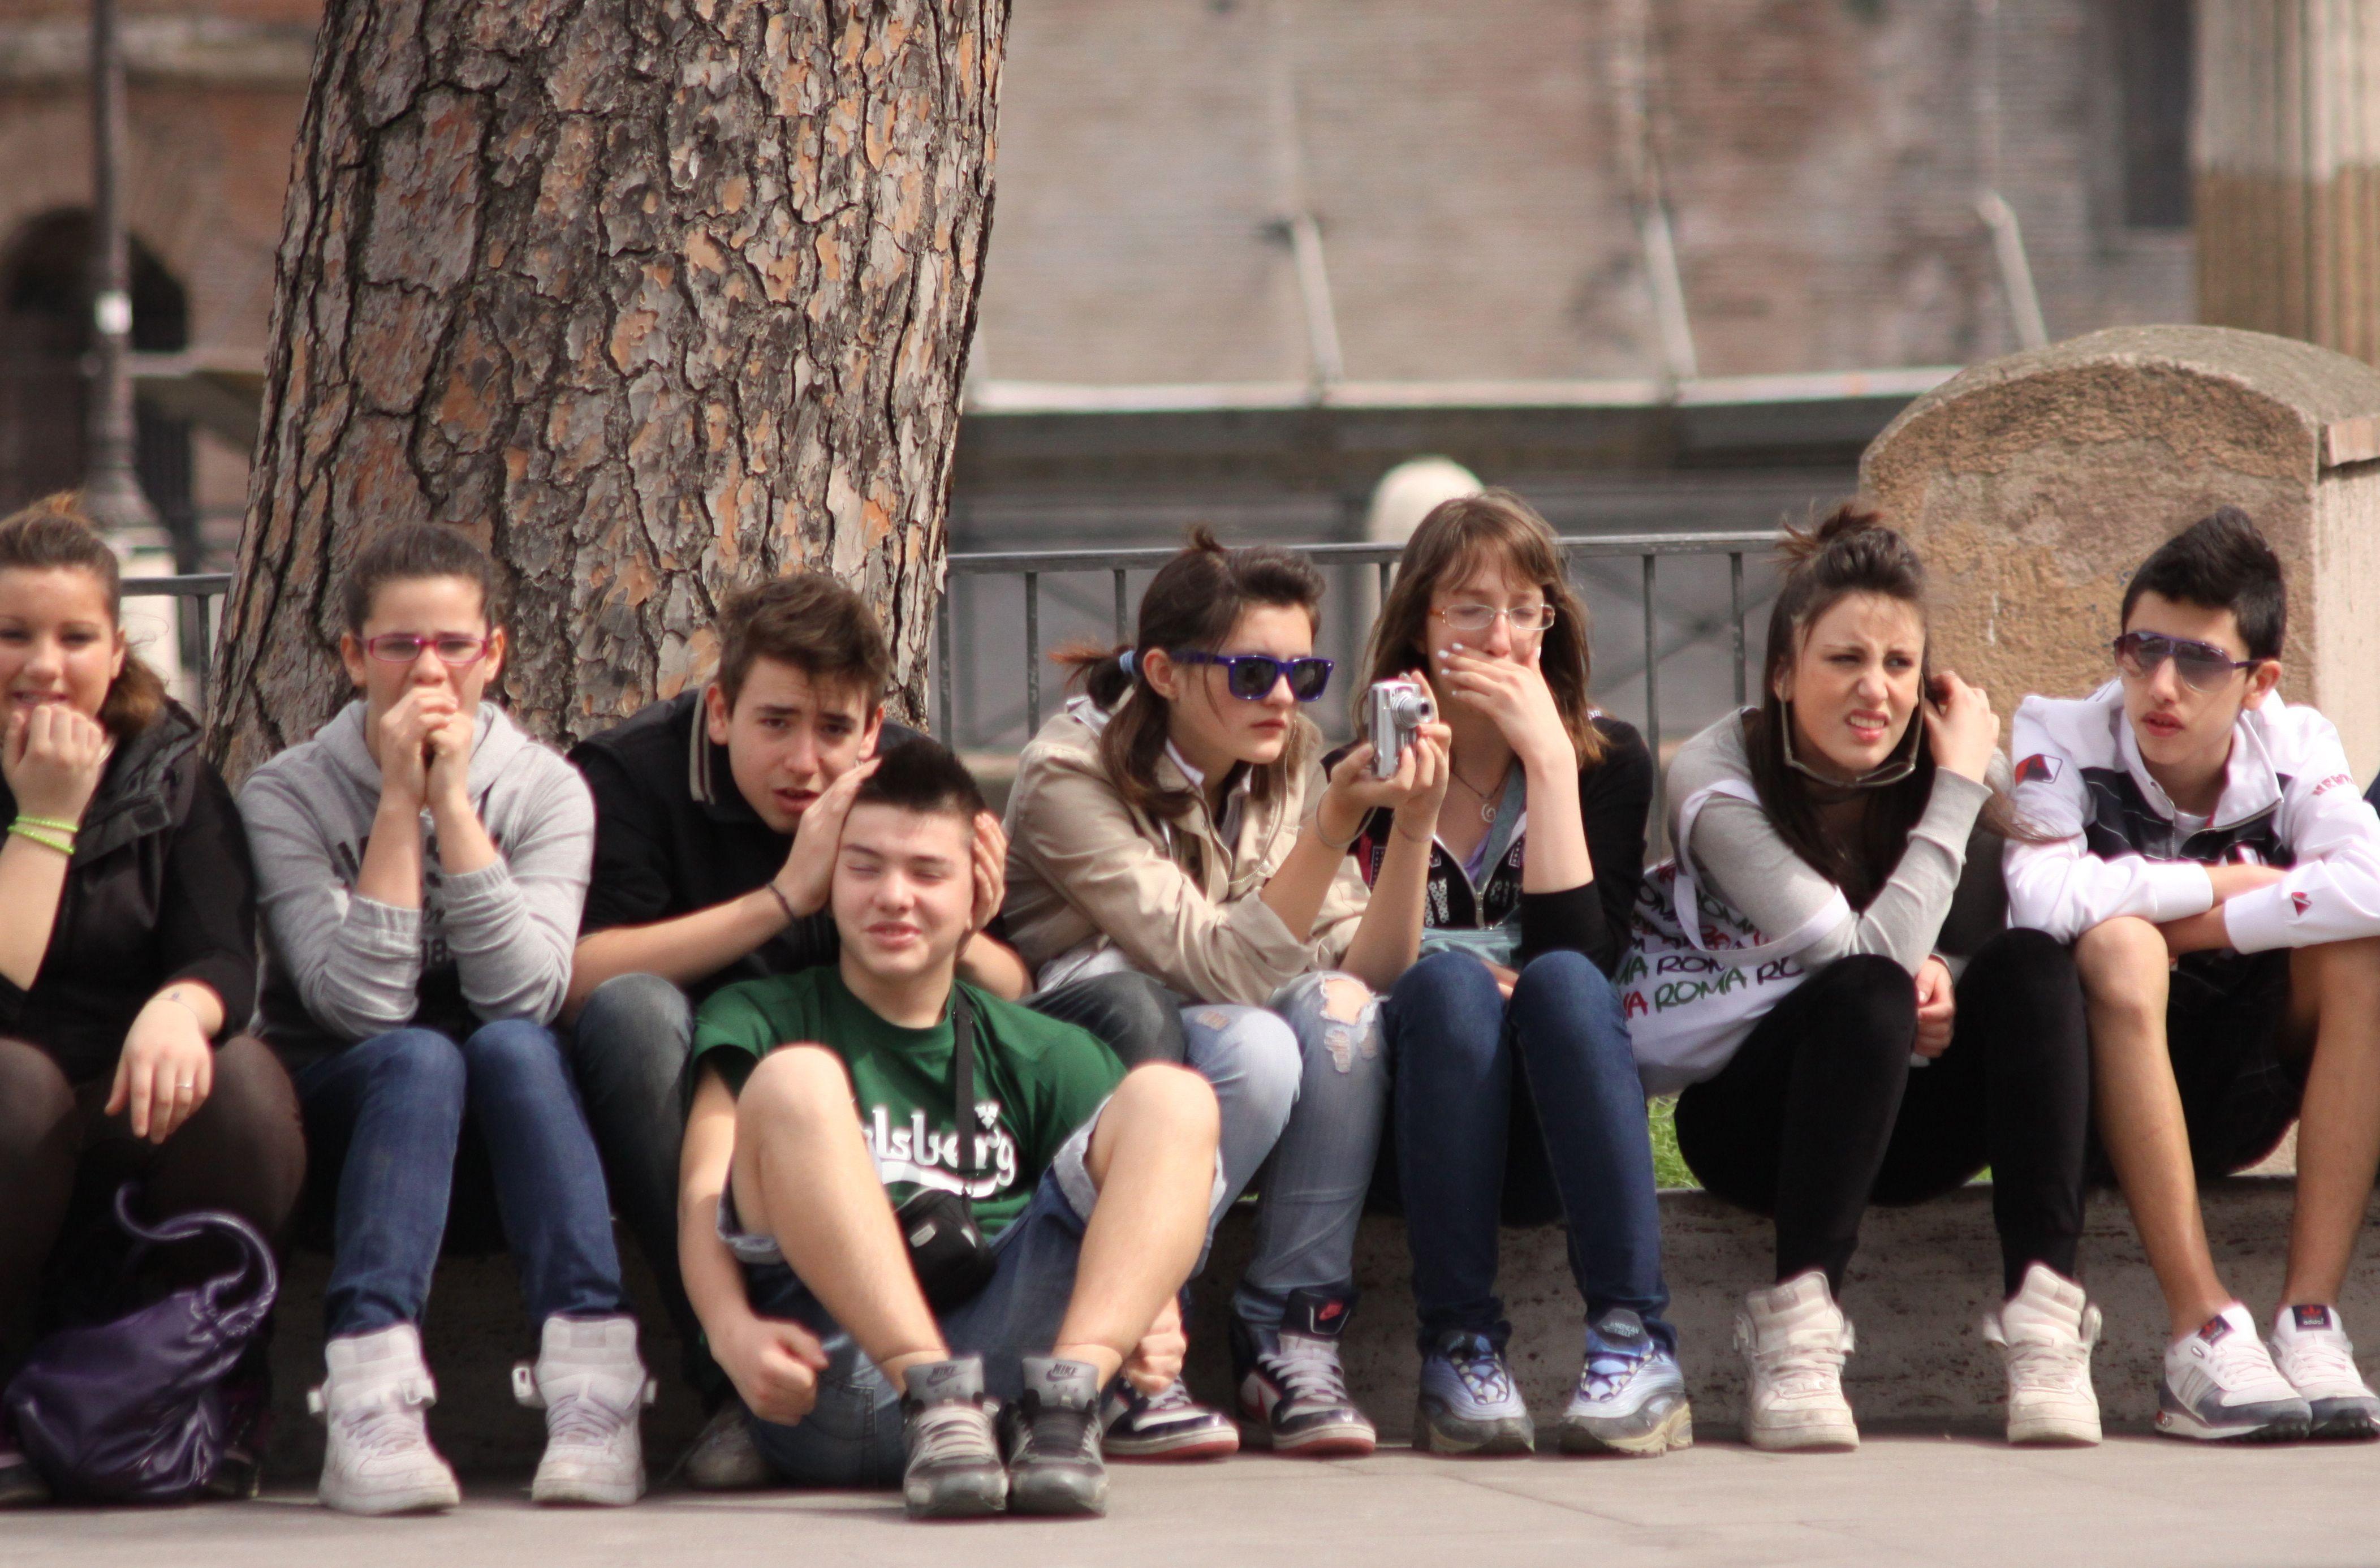 Italian Teens On Field Trip In Rome The Body Language